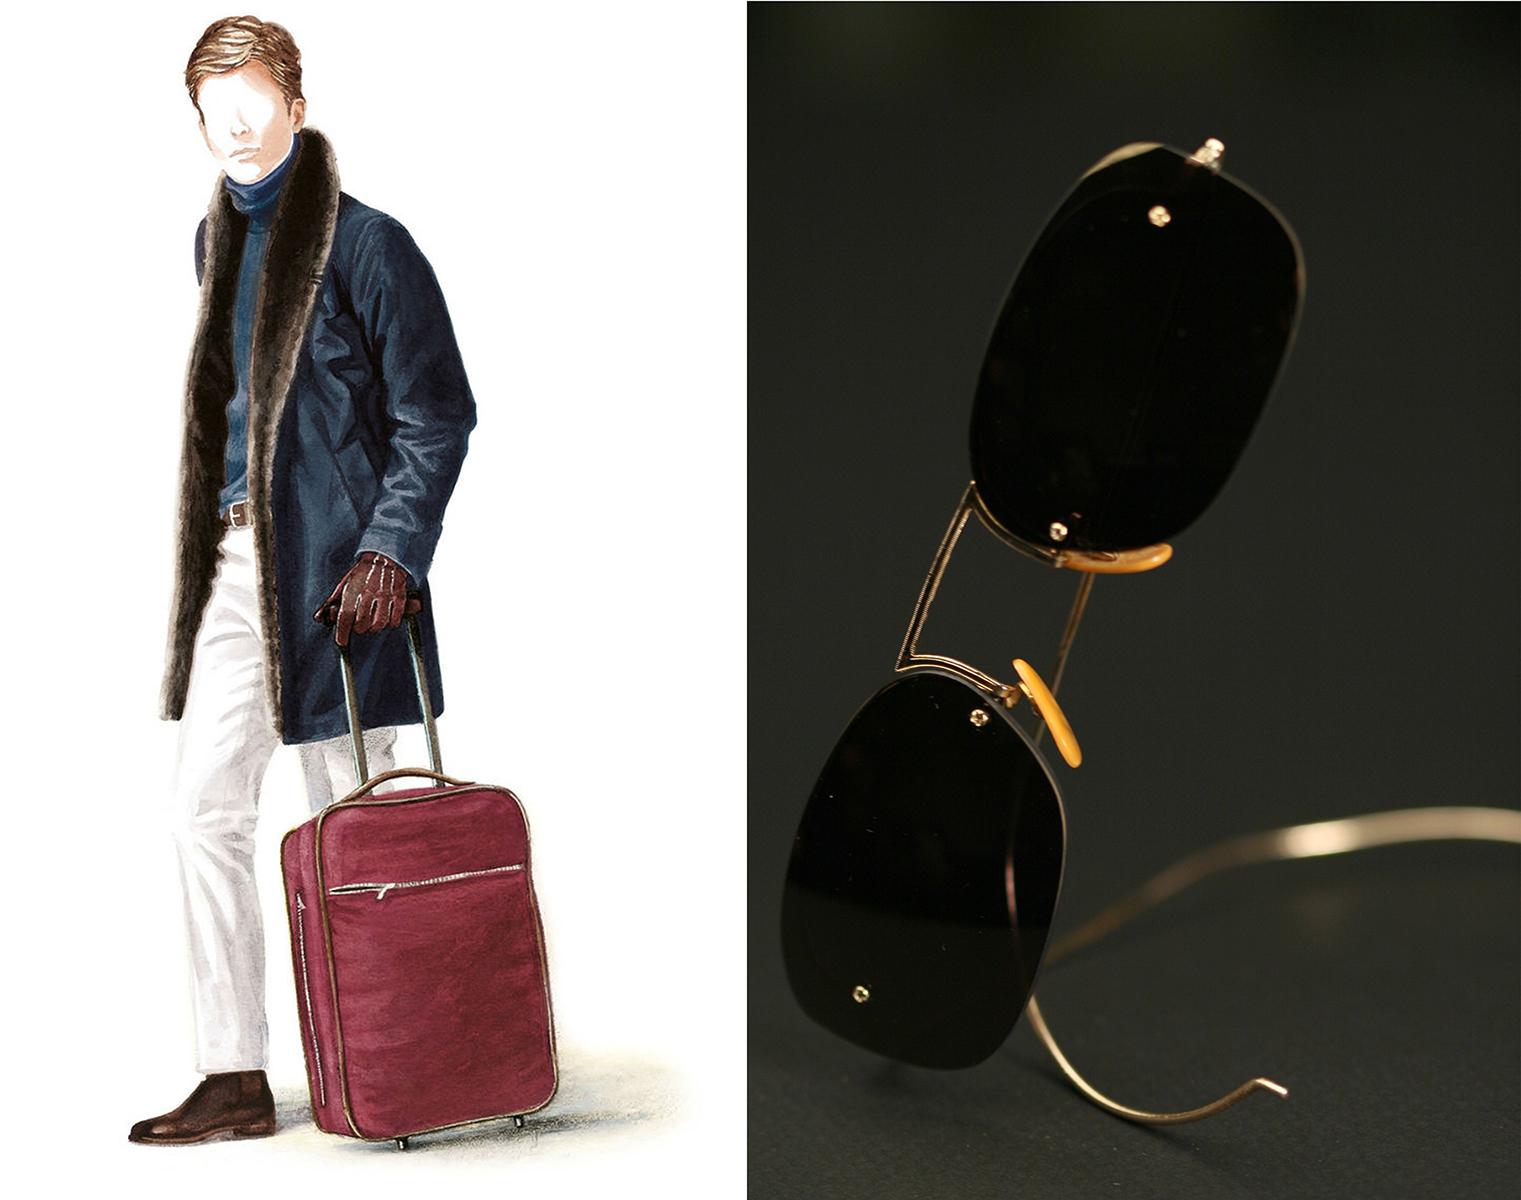 Loro Piana travel bags for the discerning traveler